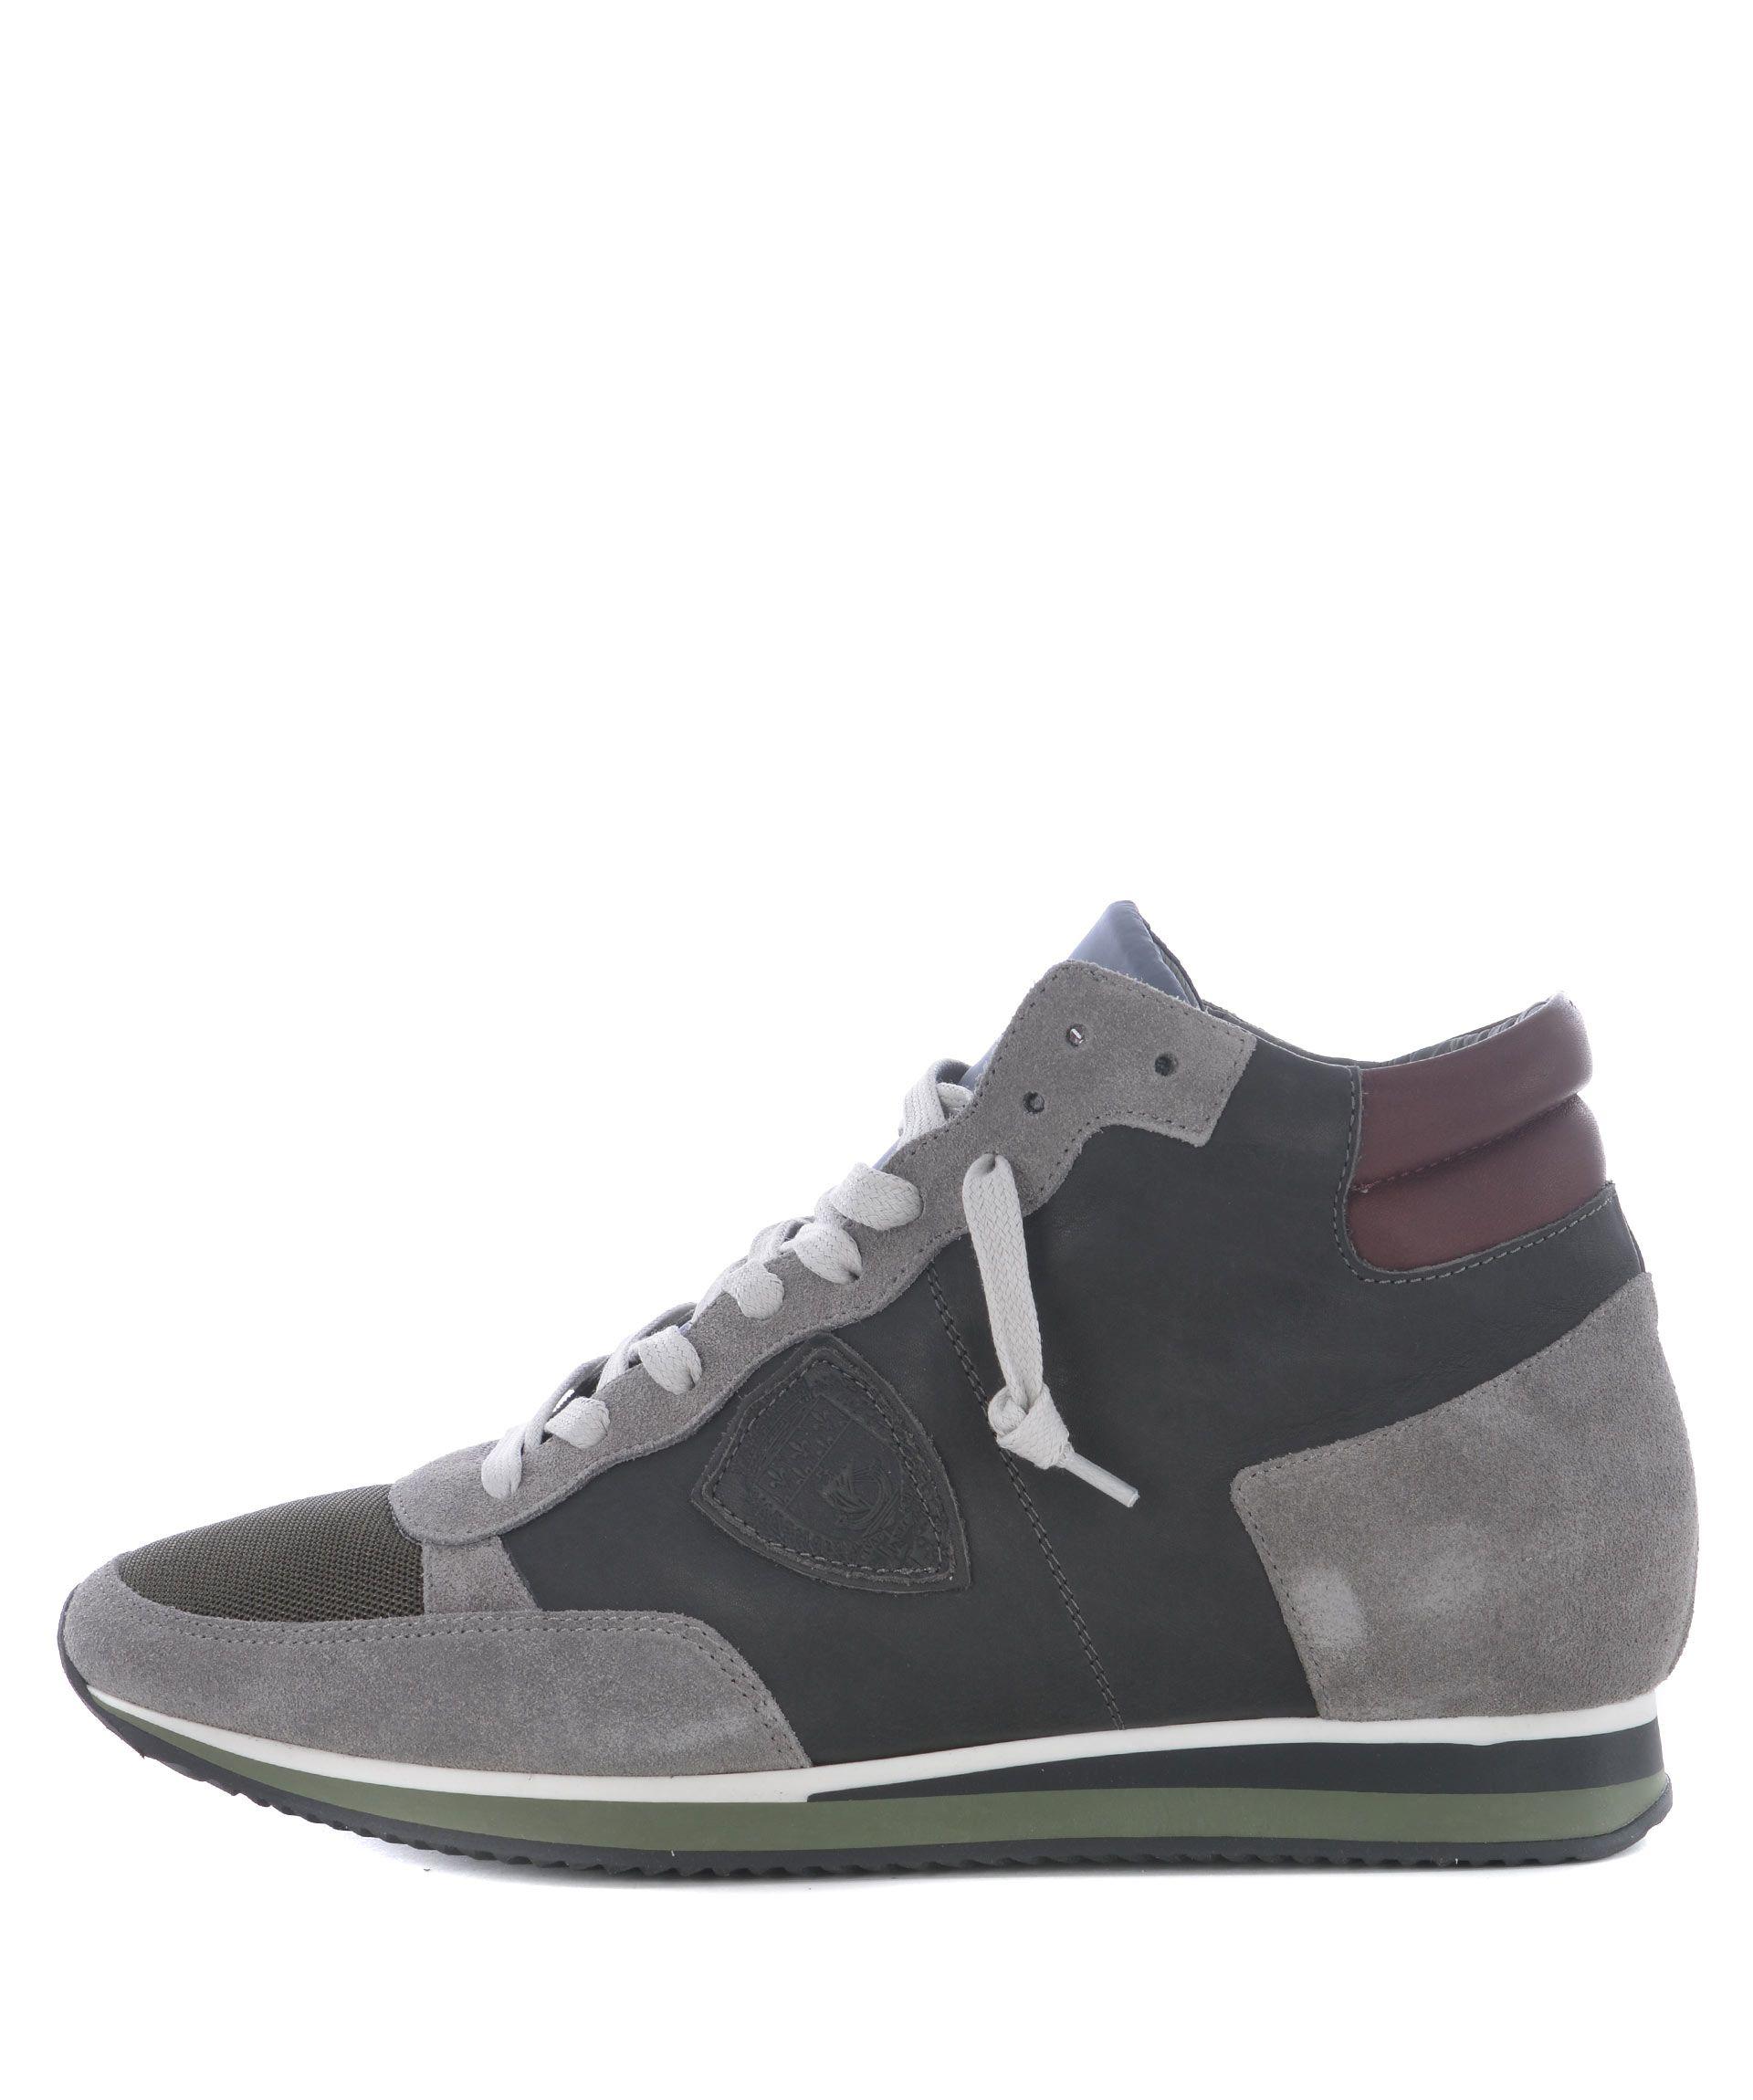 Philippe Model Tropez Hi-top Sneakers